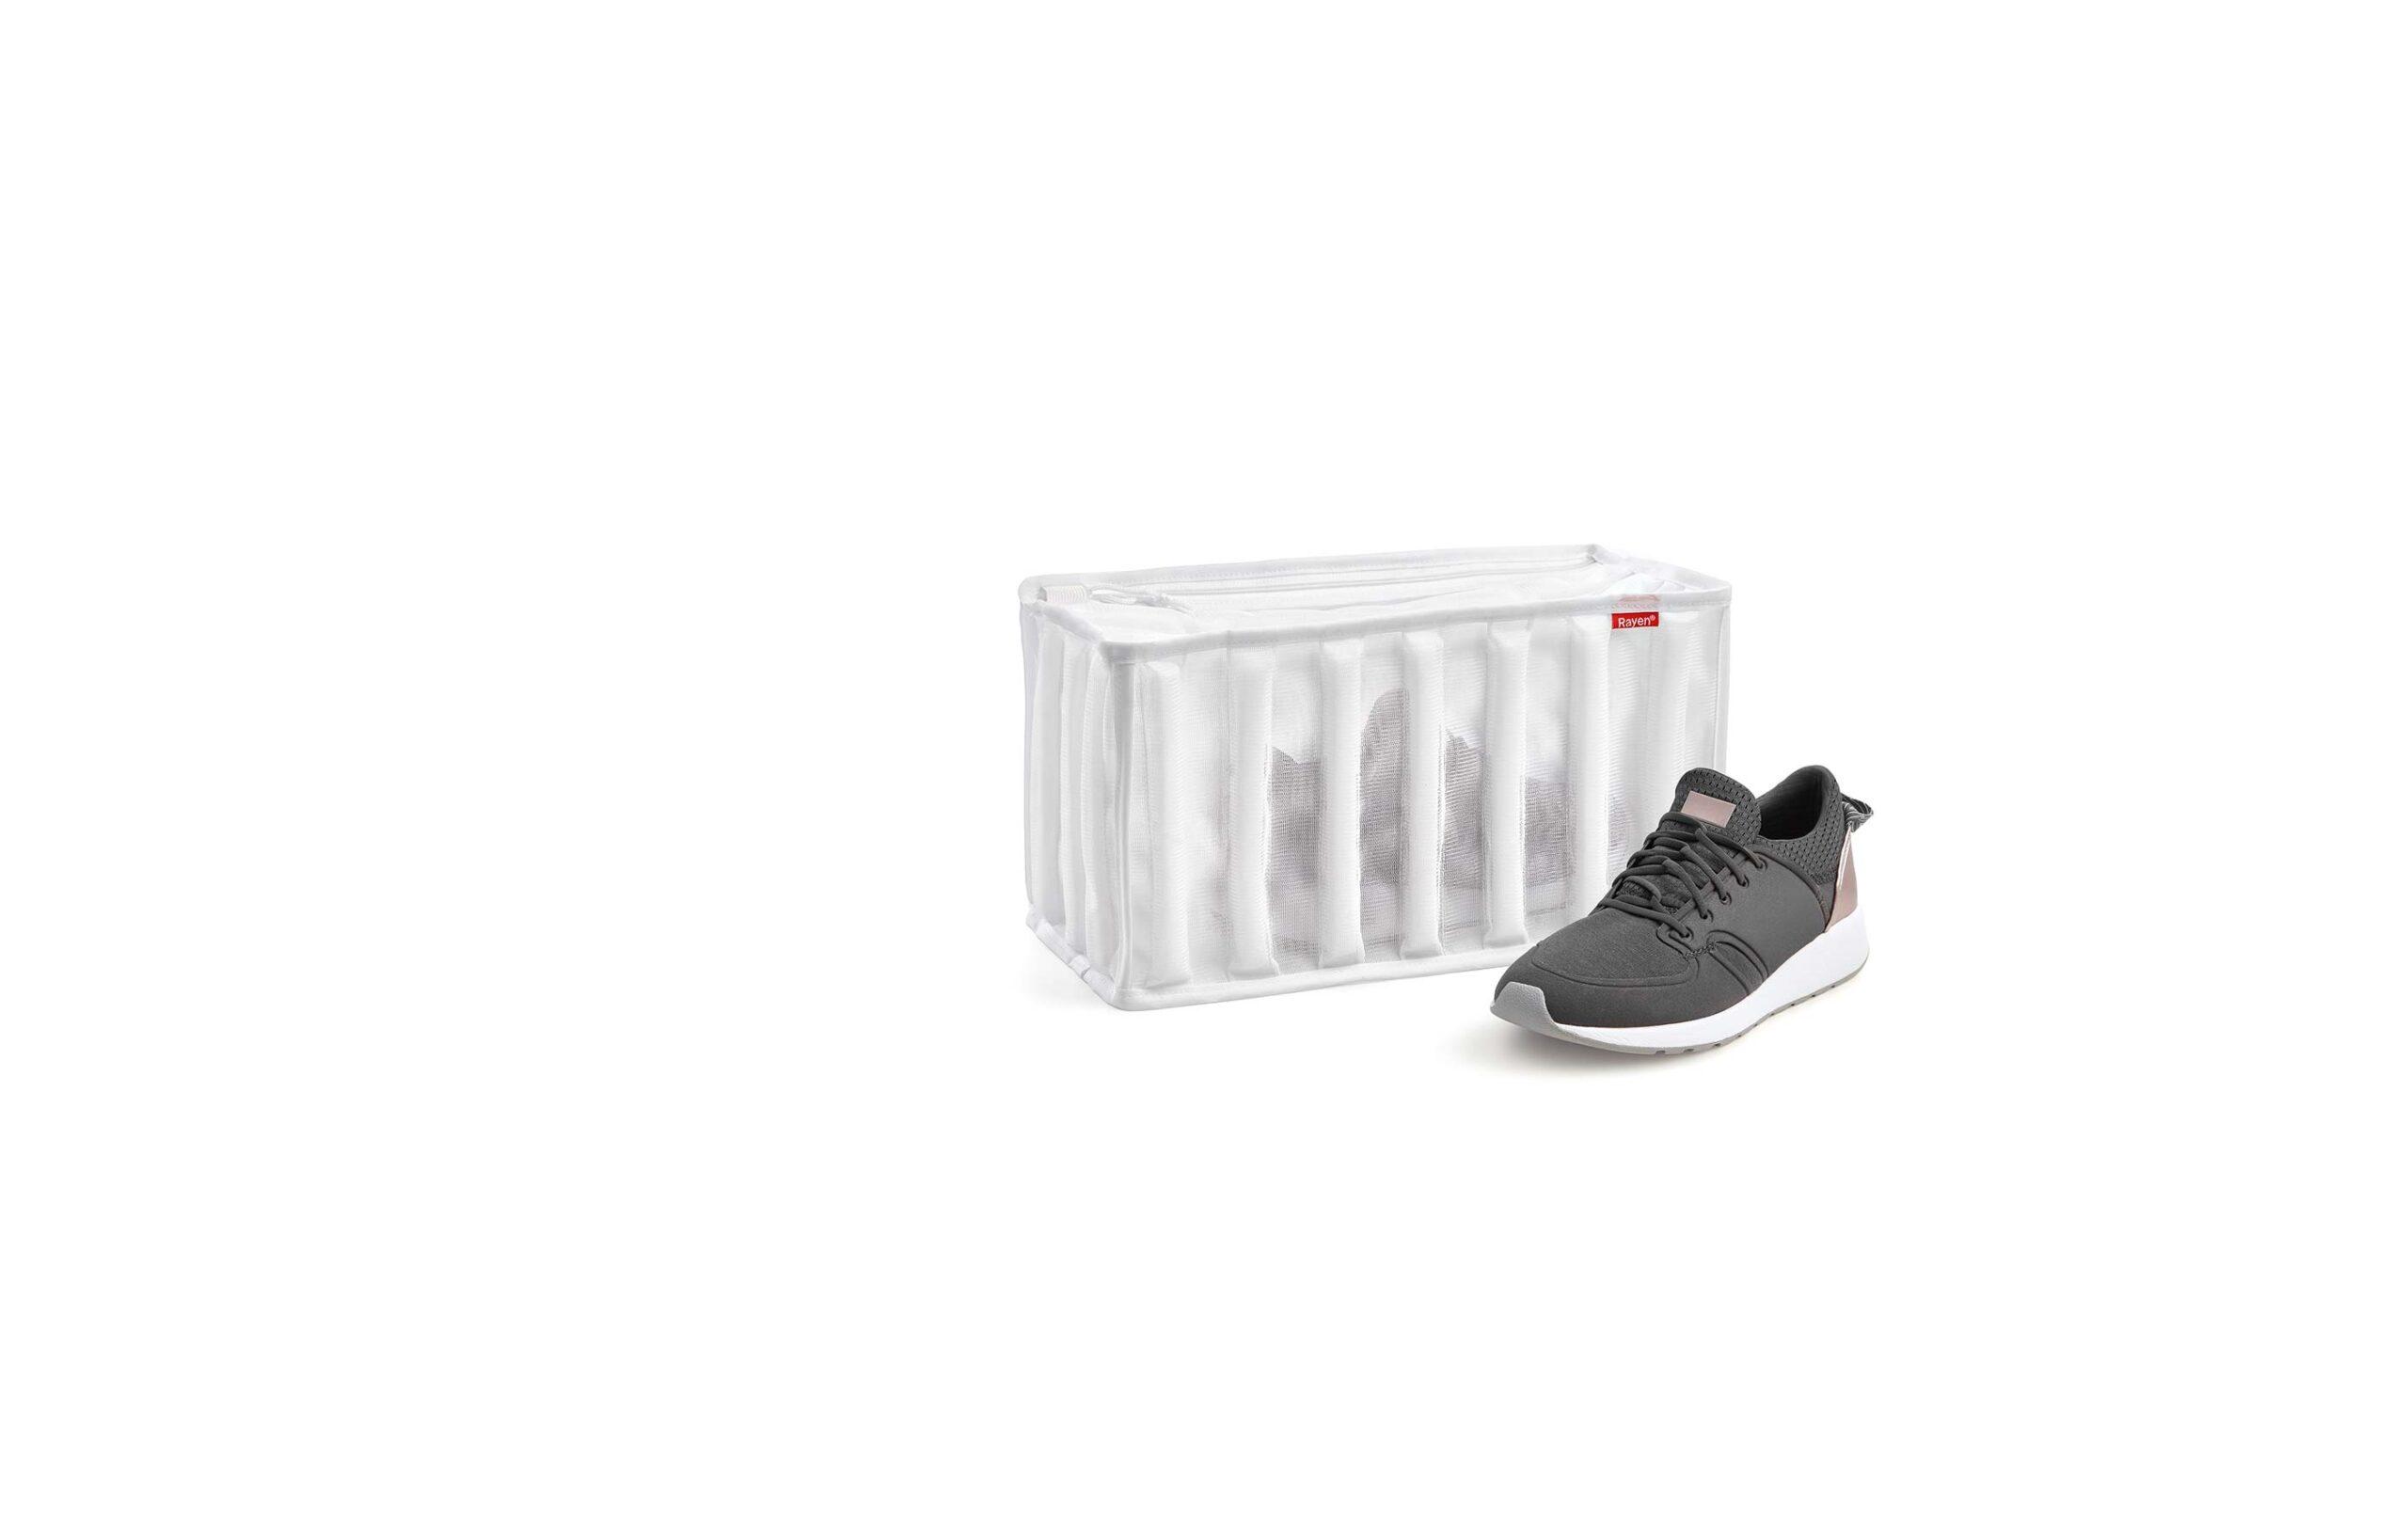 bolsa-lavadora-2-scaled bolsa-lavadora-2 | Rayen.com